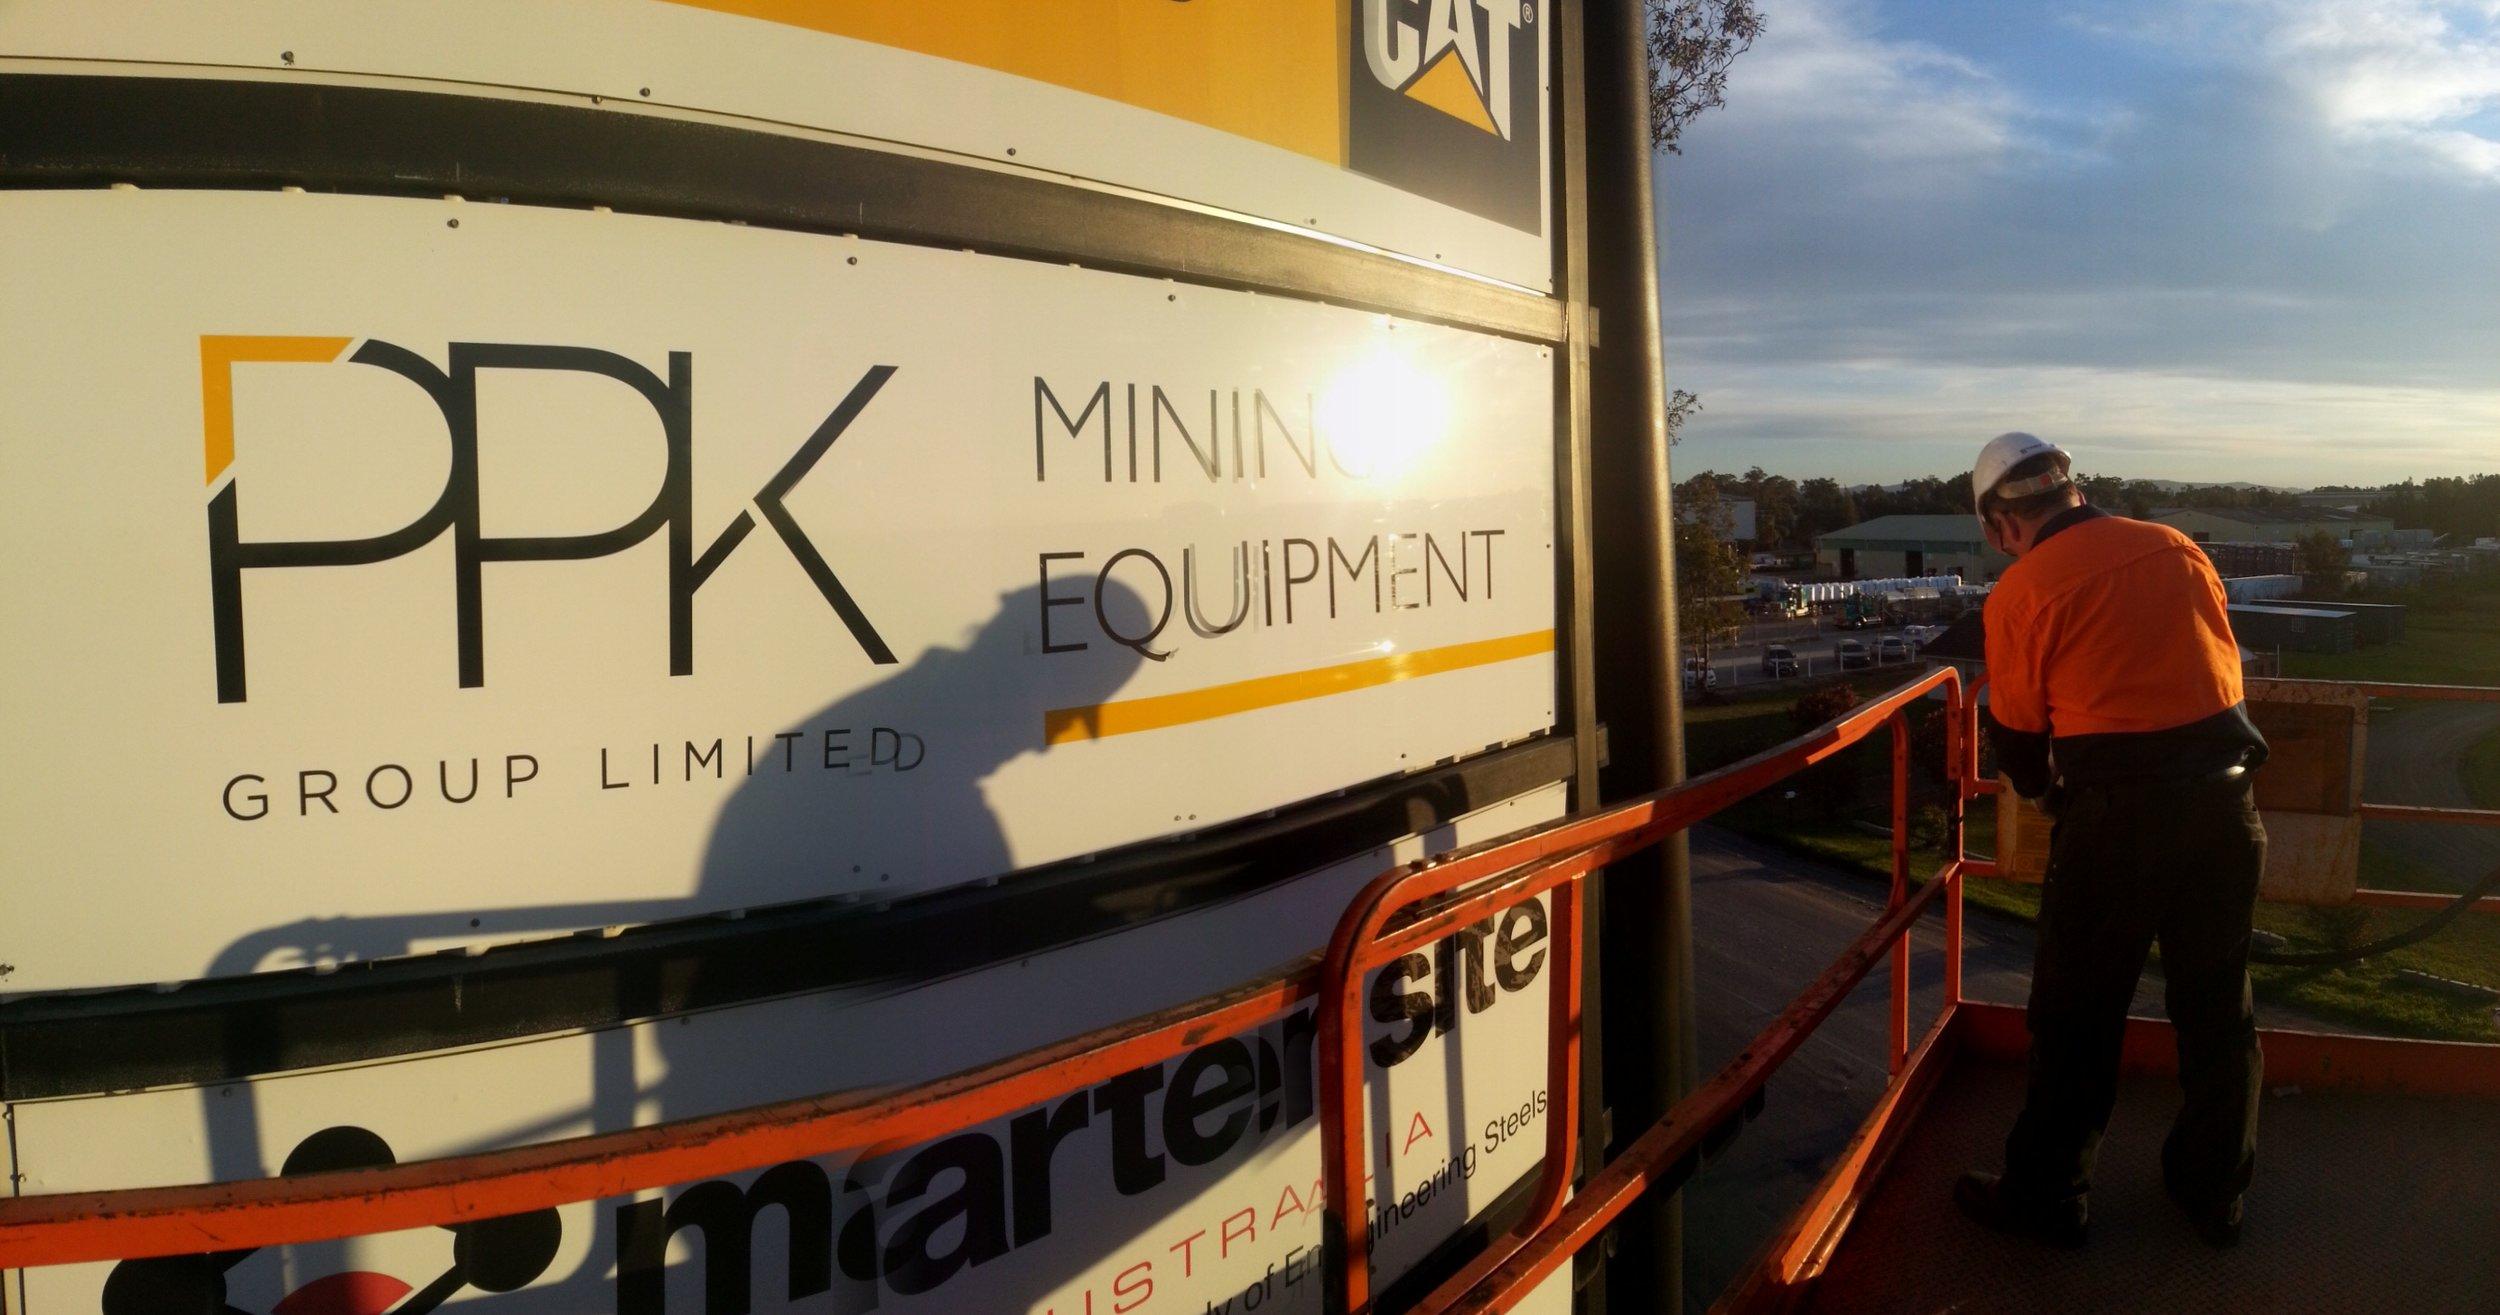 PPK pylon sign